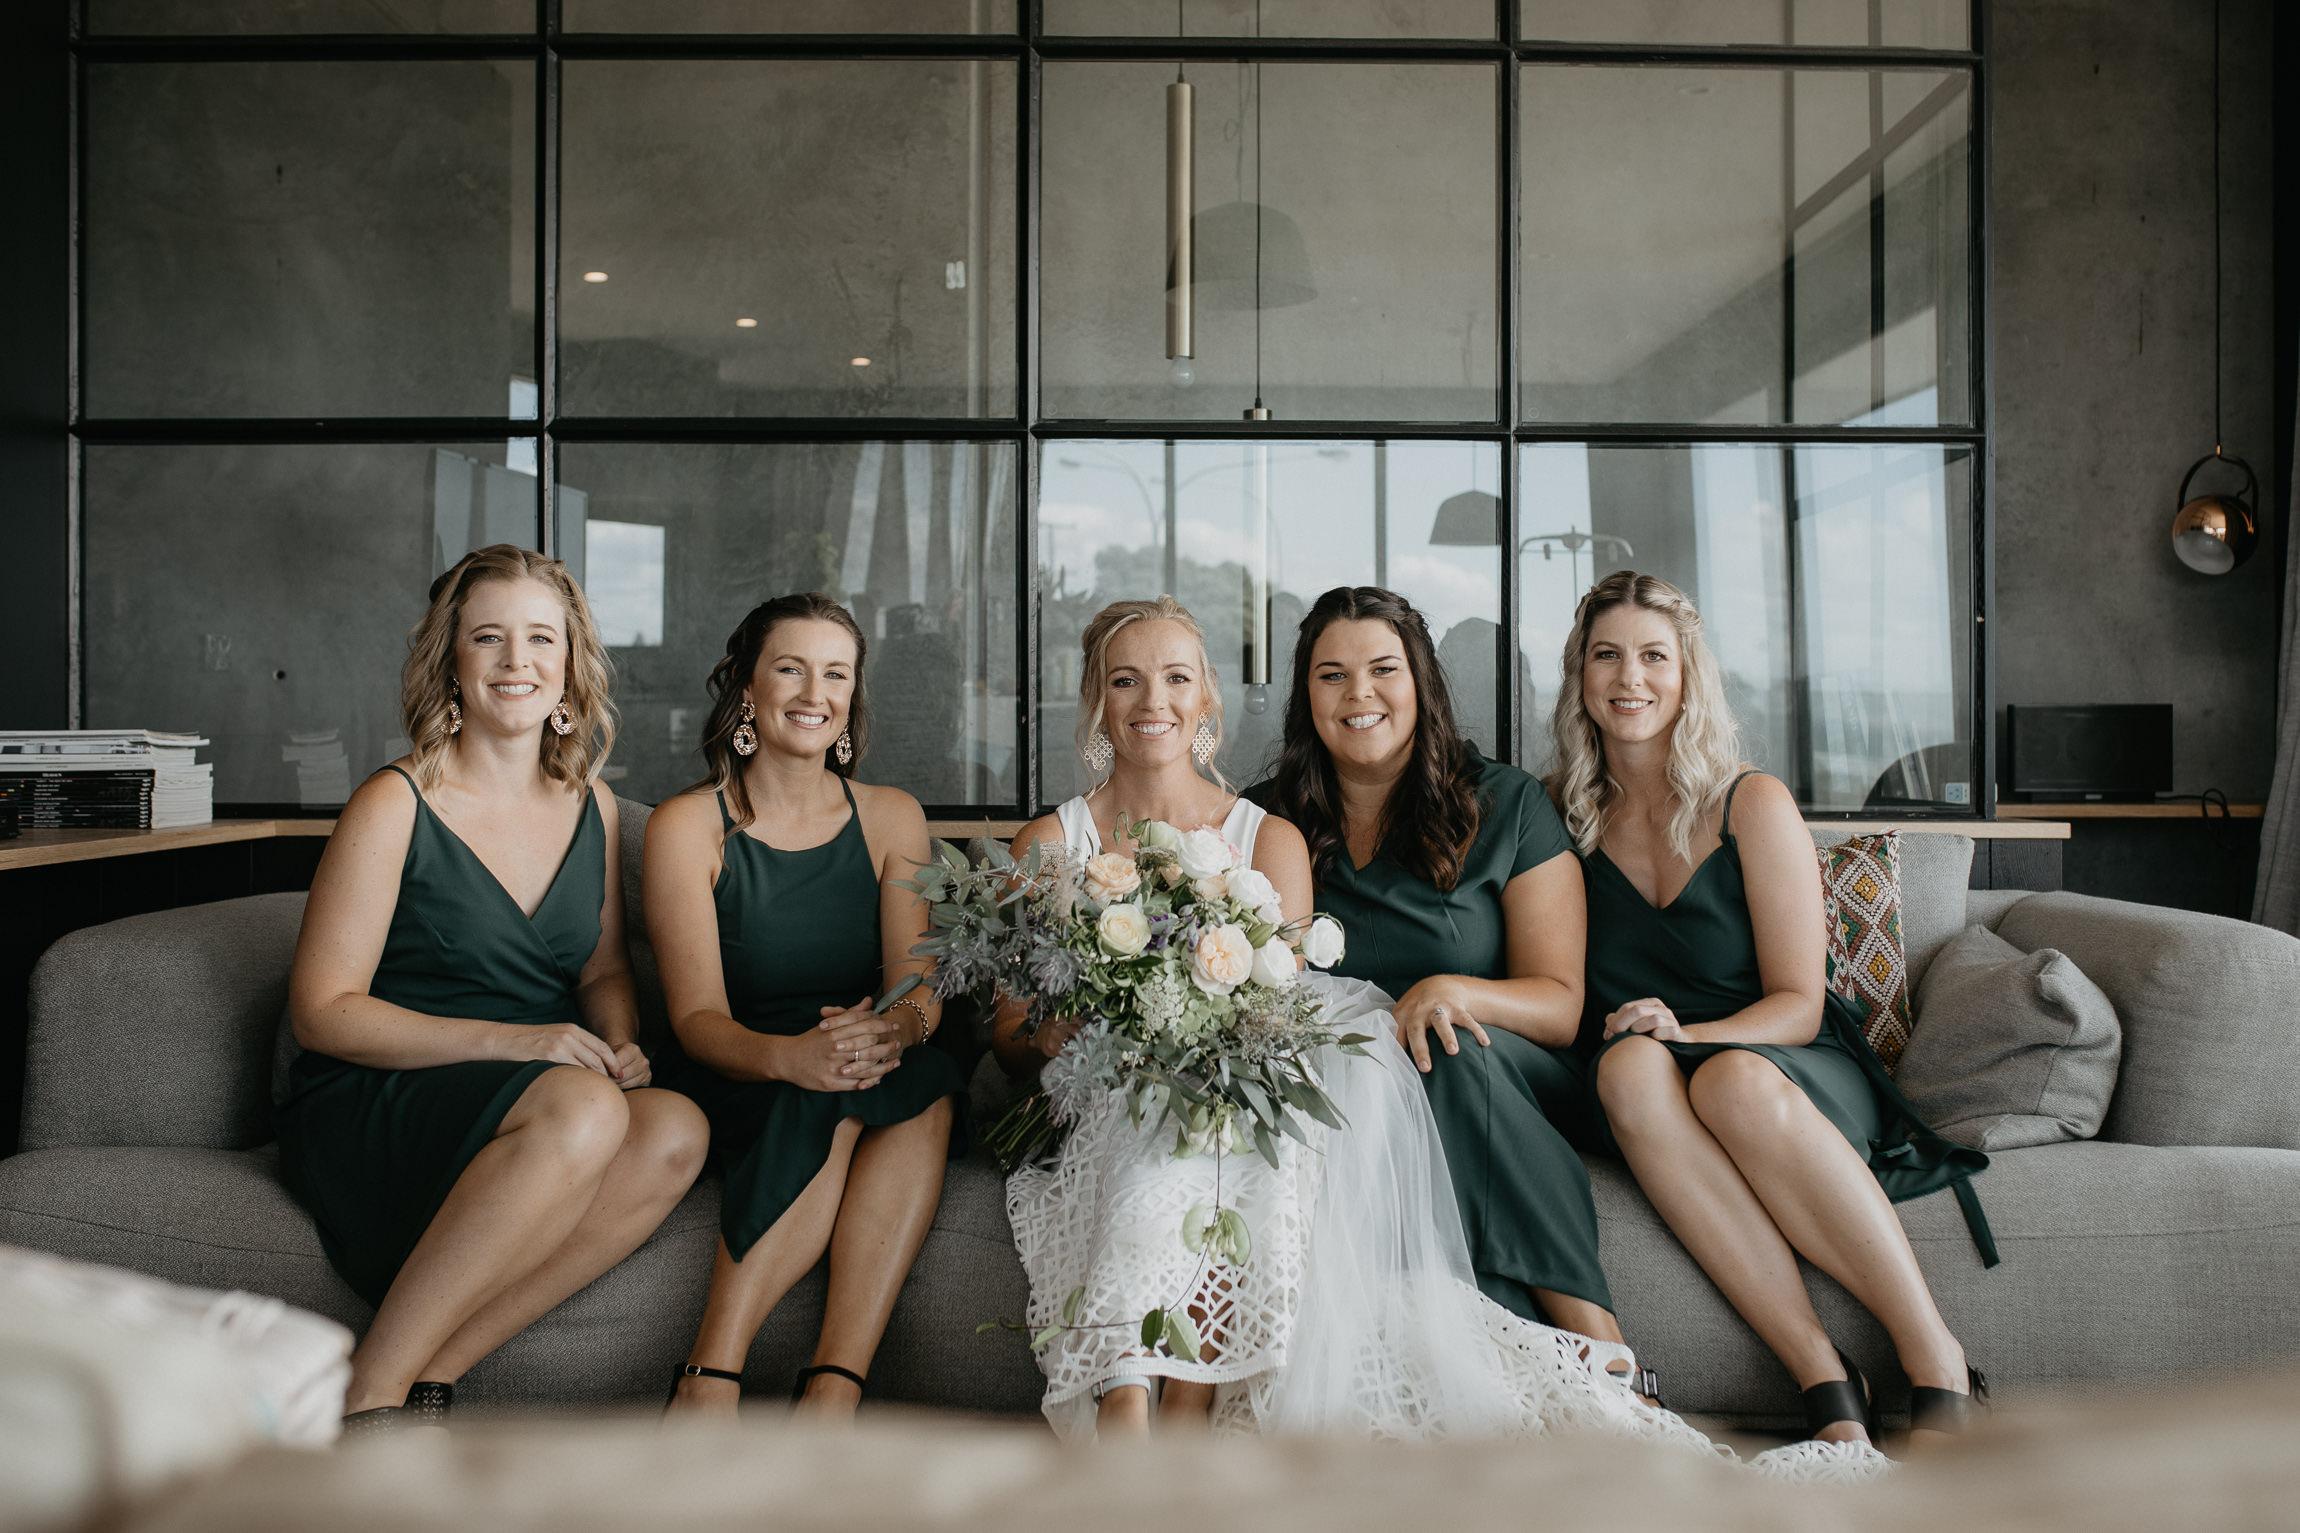 oldforestschool-wedding-blog-18.jpg